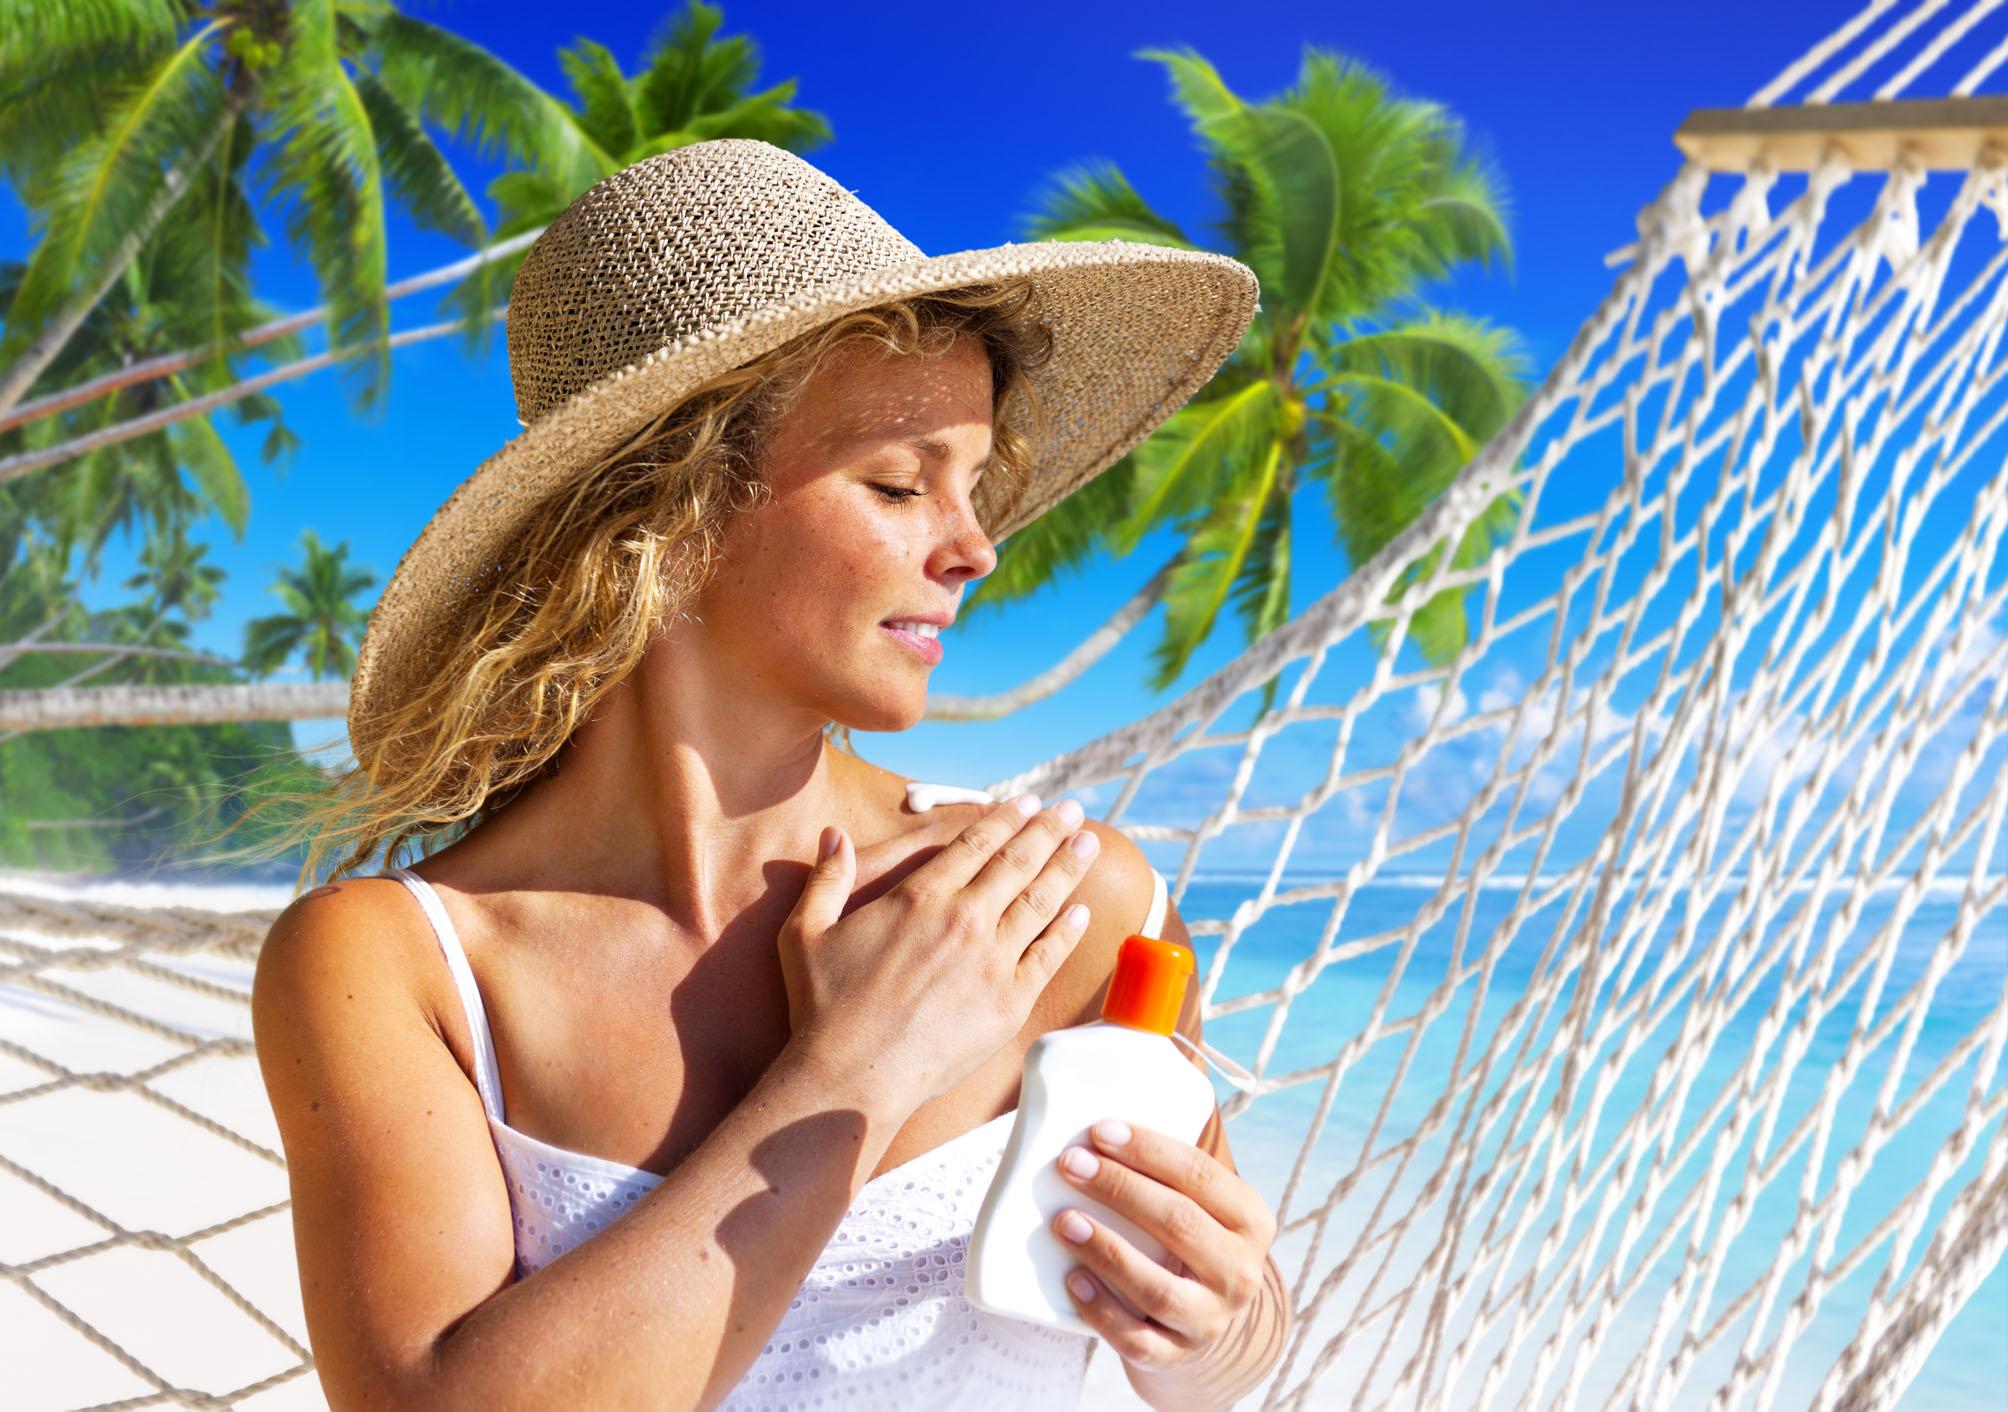 Woman Applying Sun Protection On skin